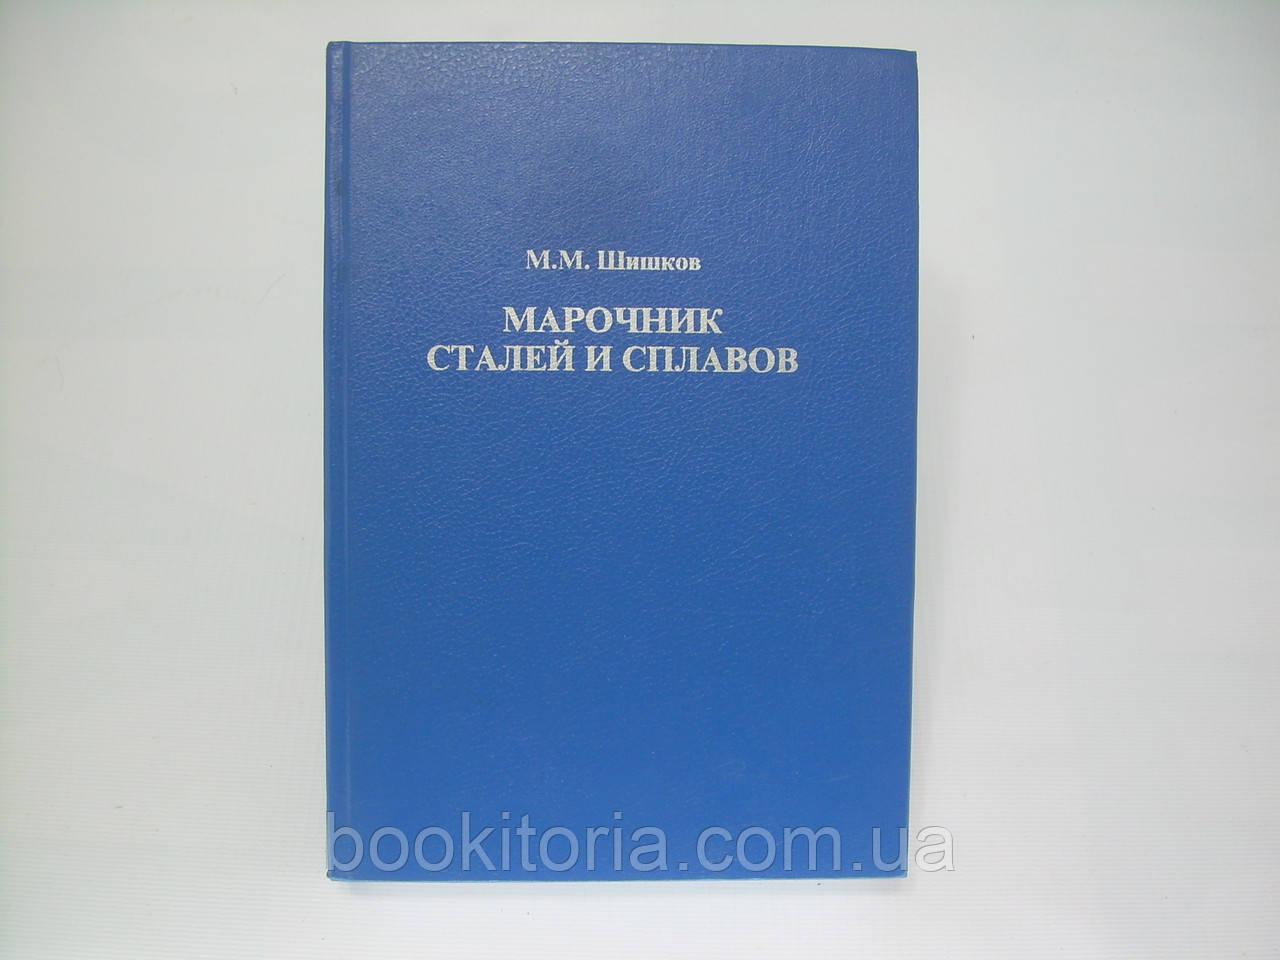 Шишков М.М. Марочник сталей и сплавов. Справочник (б/у).